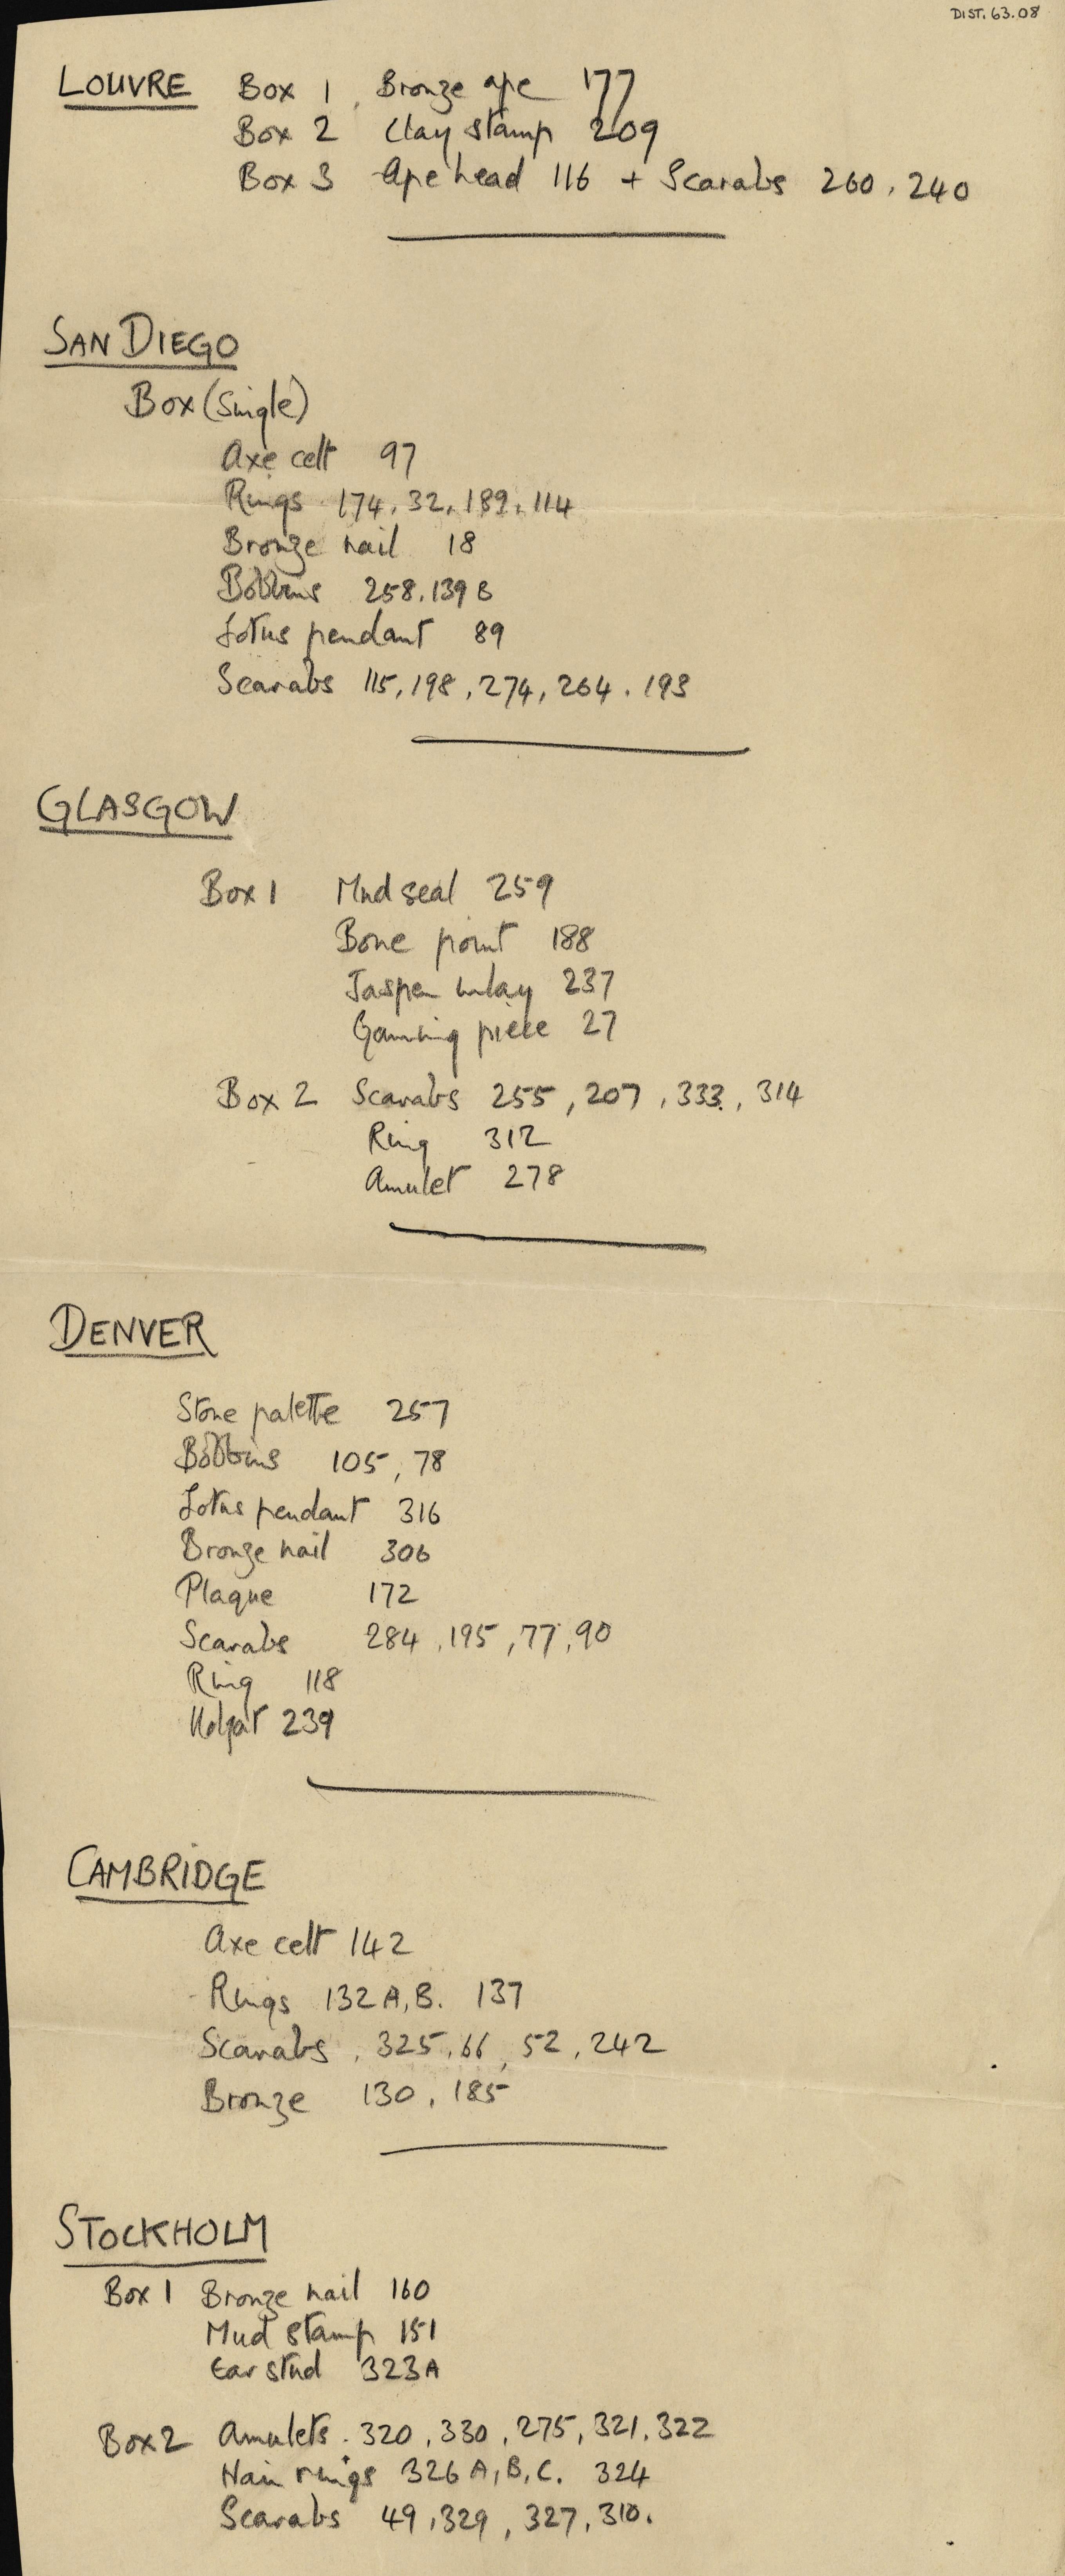 1936-39 Amarah West, Sesebi DIST.63.08